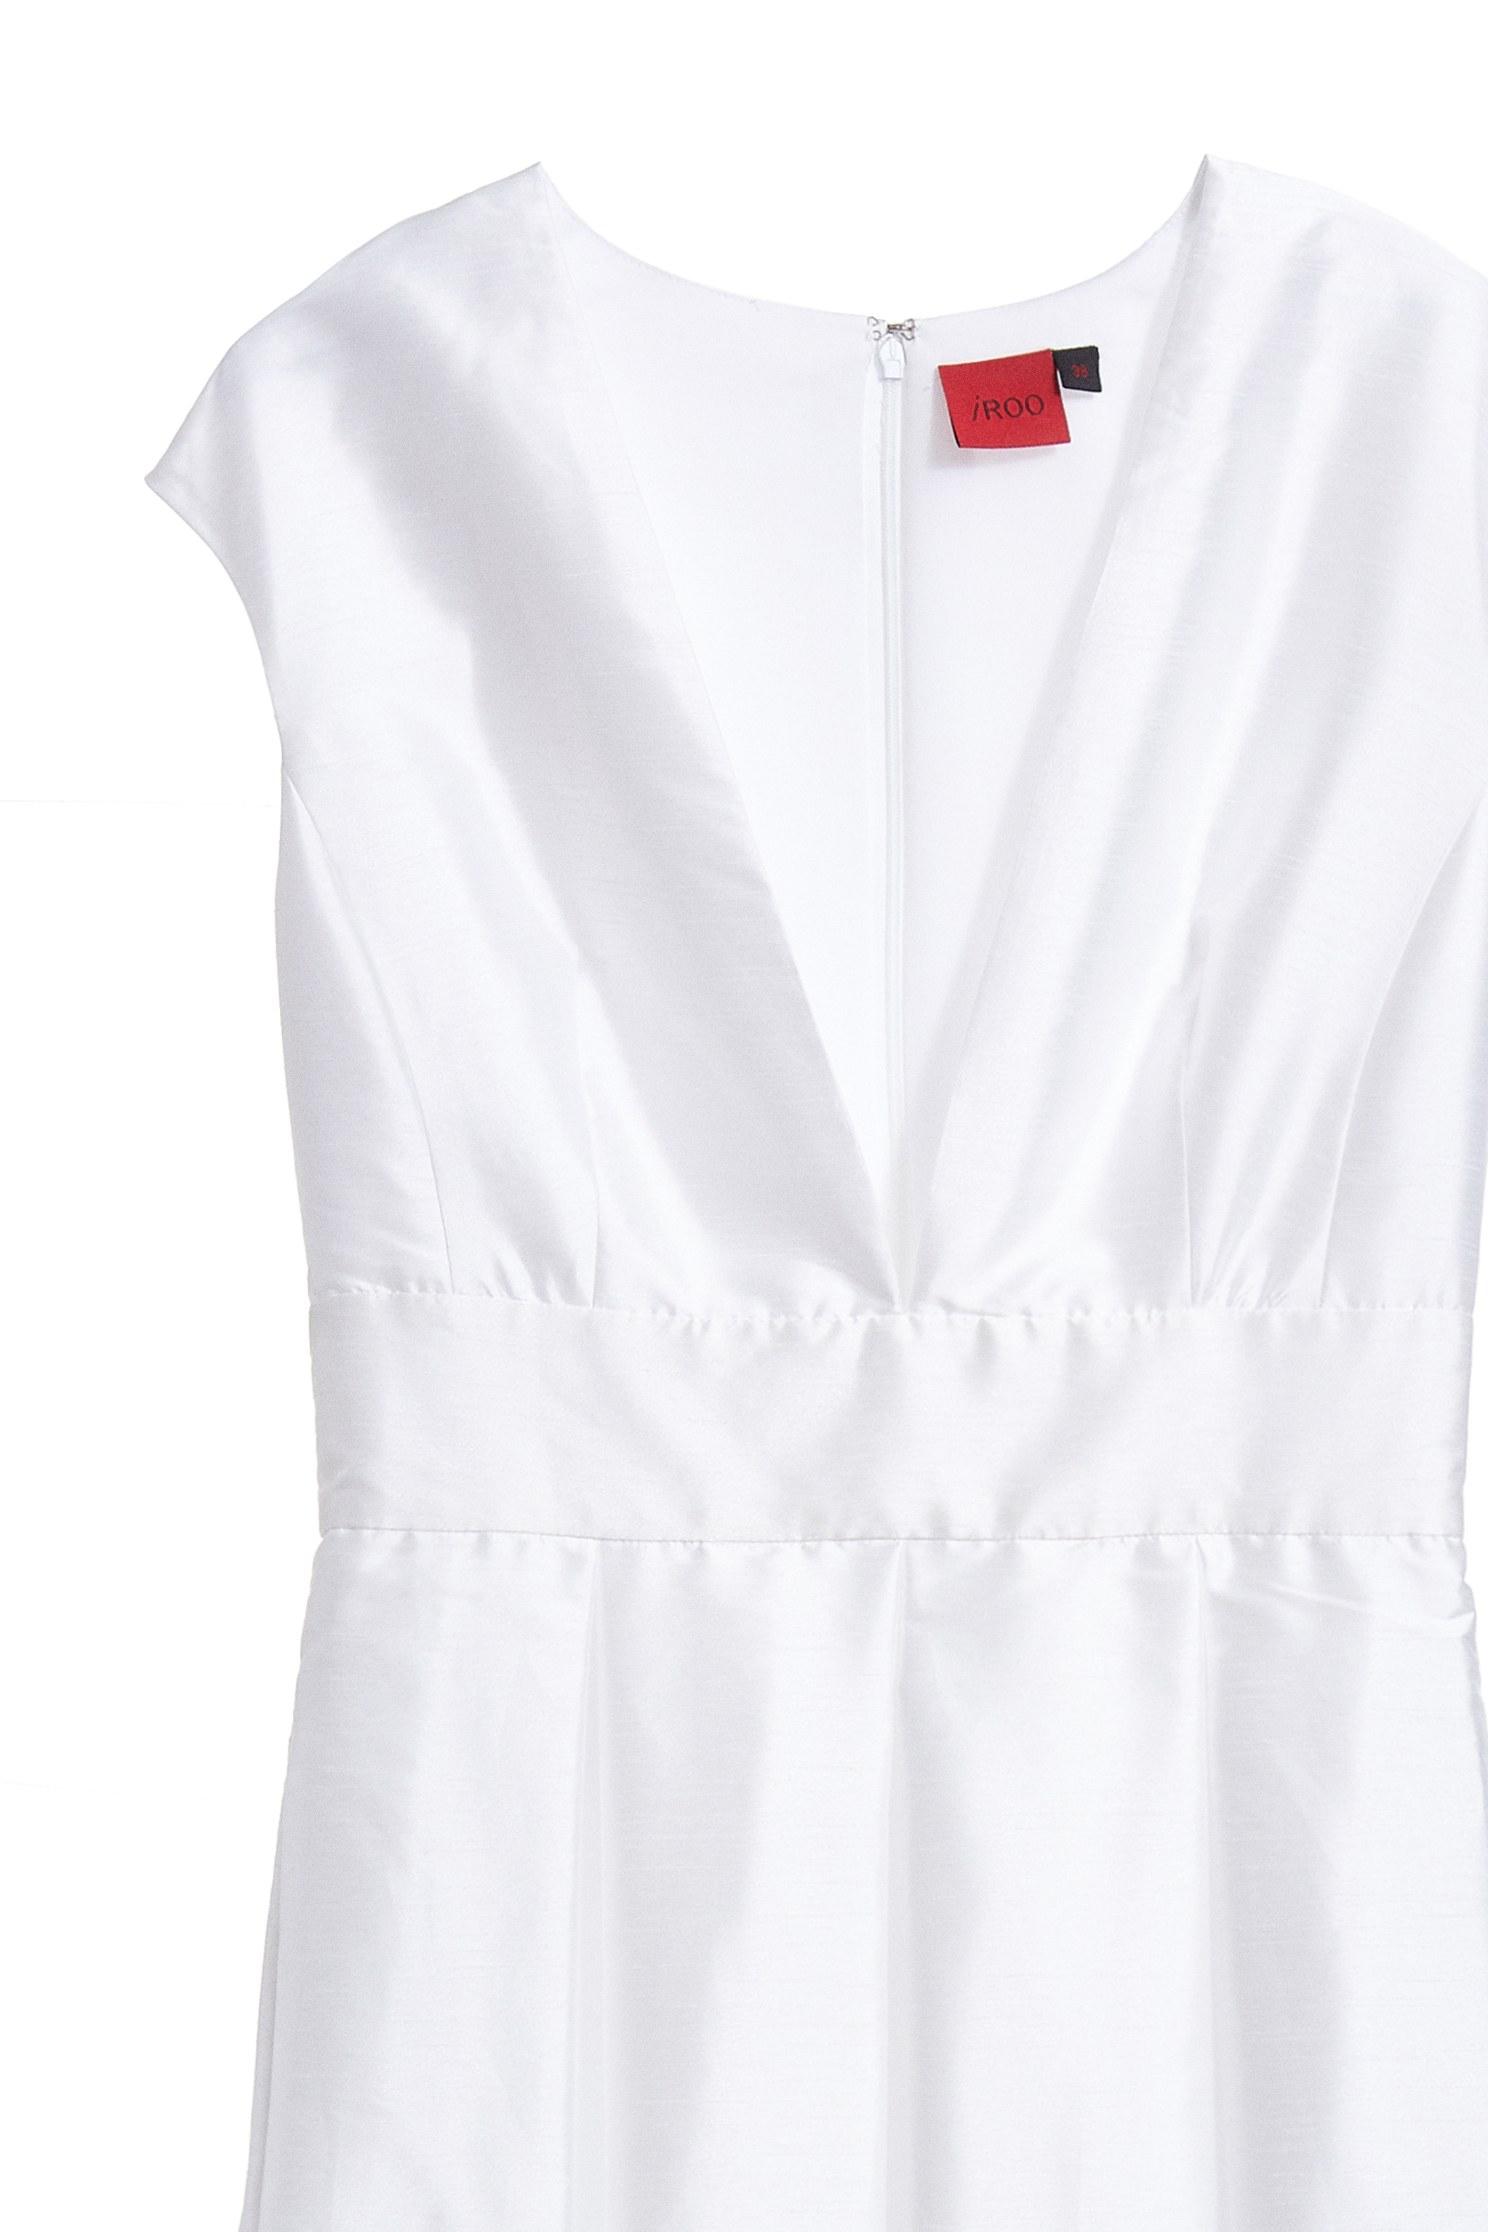 Luxury satin V neck dress,V-neck dress,Cocktail Dress,無袖洋裝,White dress,Evening Wear,Long dress